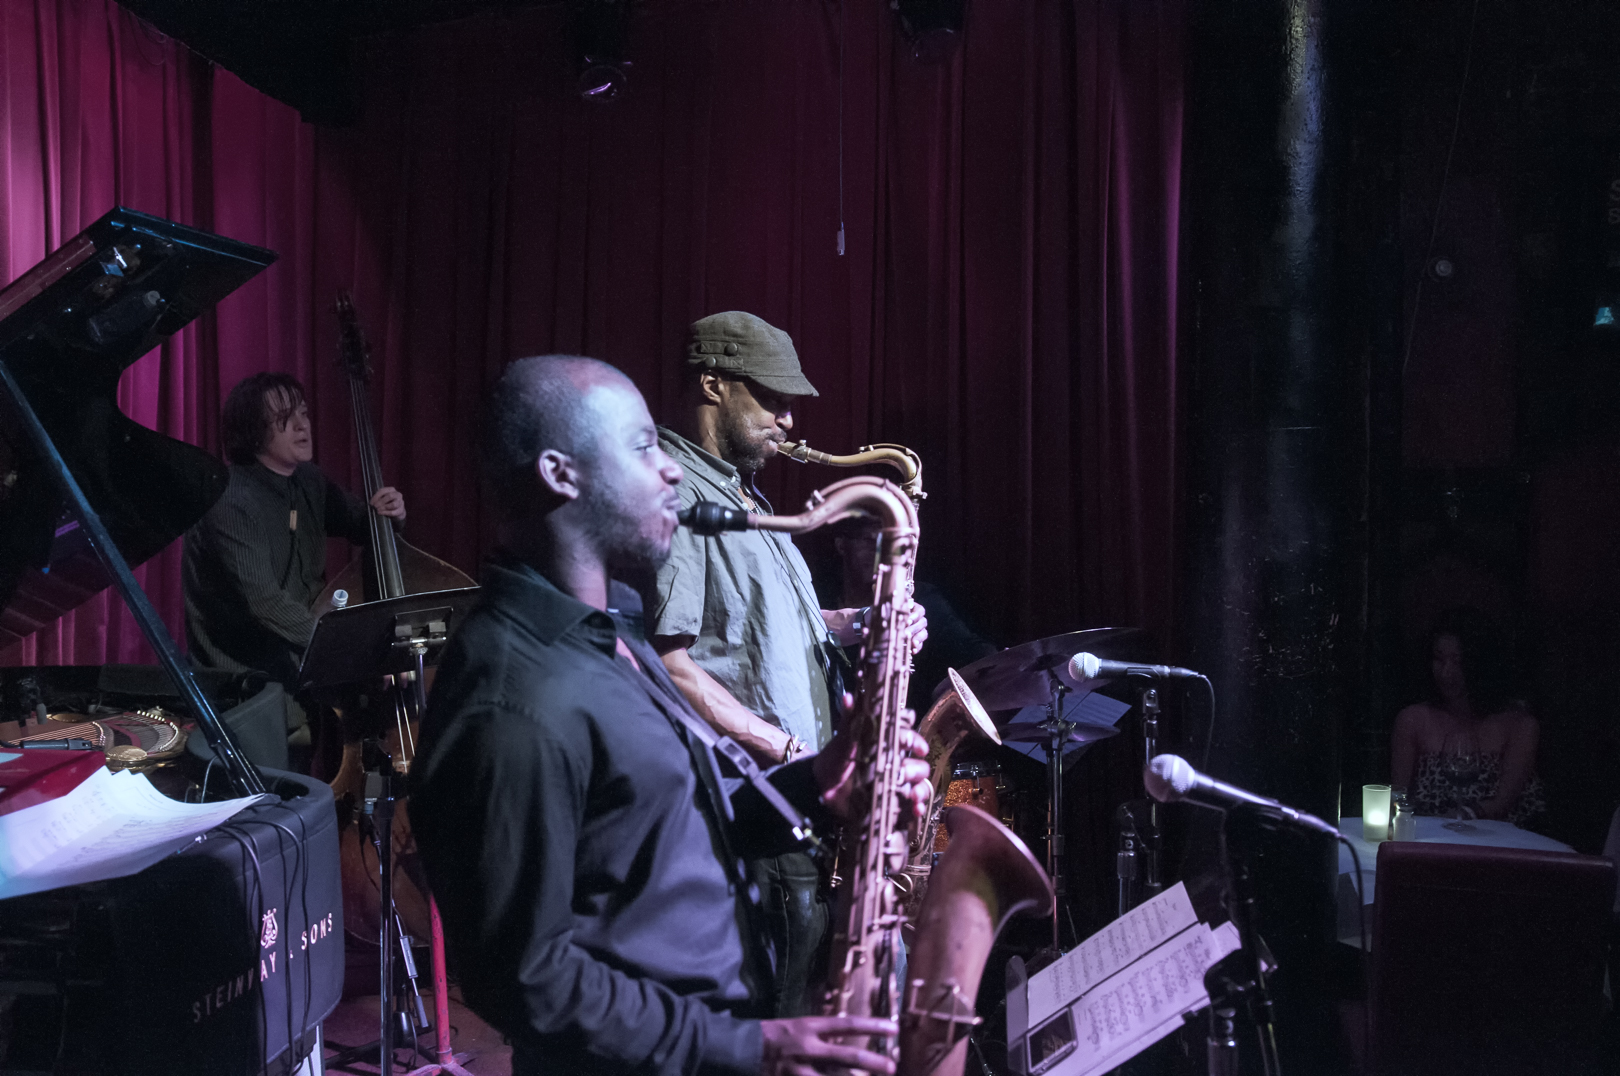 Tivon Pennicott and Stacy Dillard with the Stacy Dillard Quintet at Smoke Jazz Club